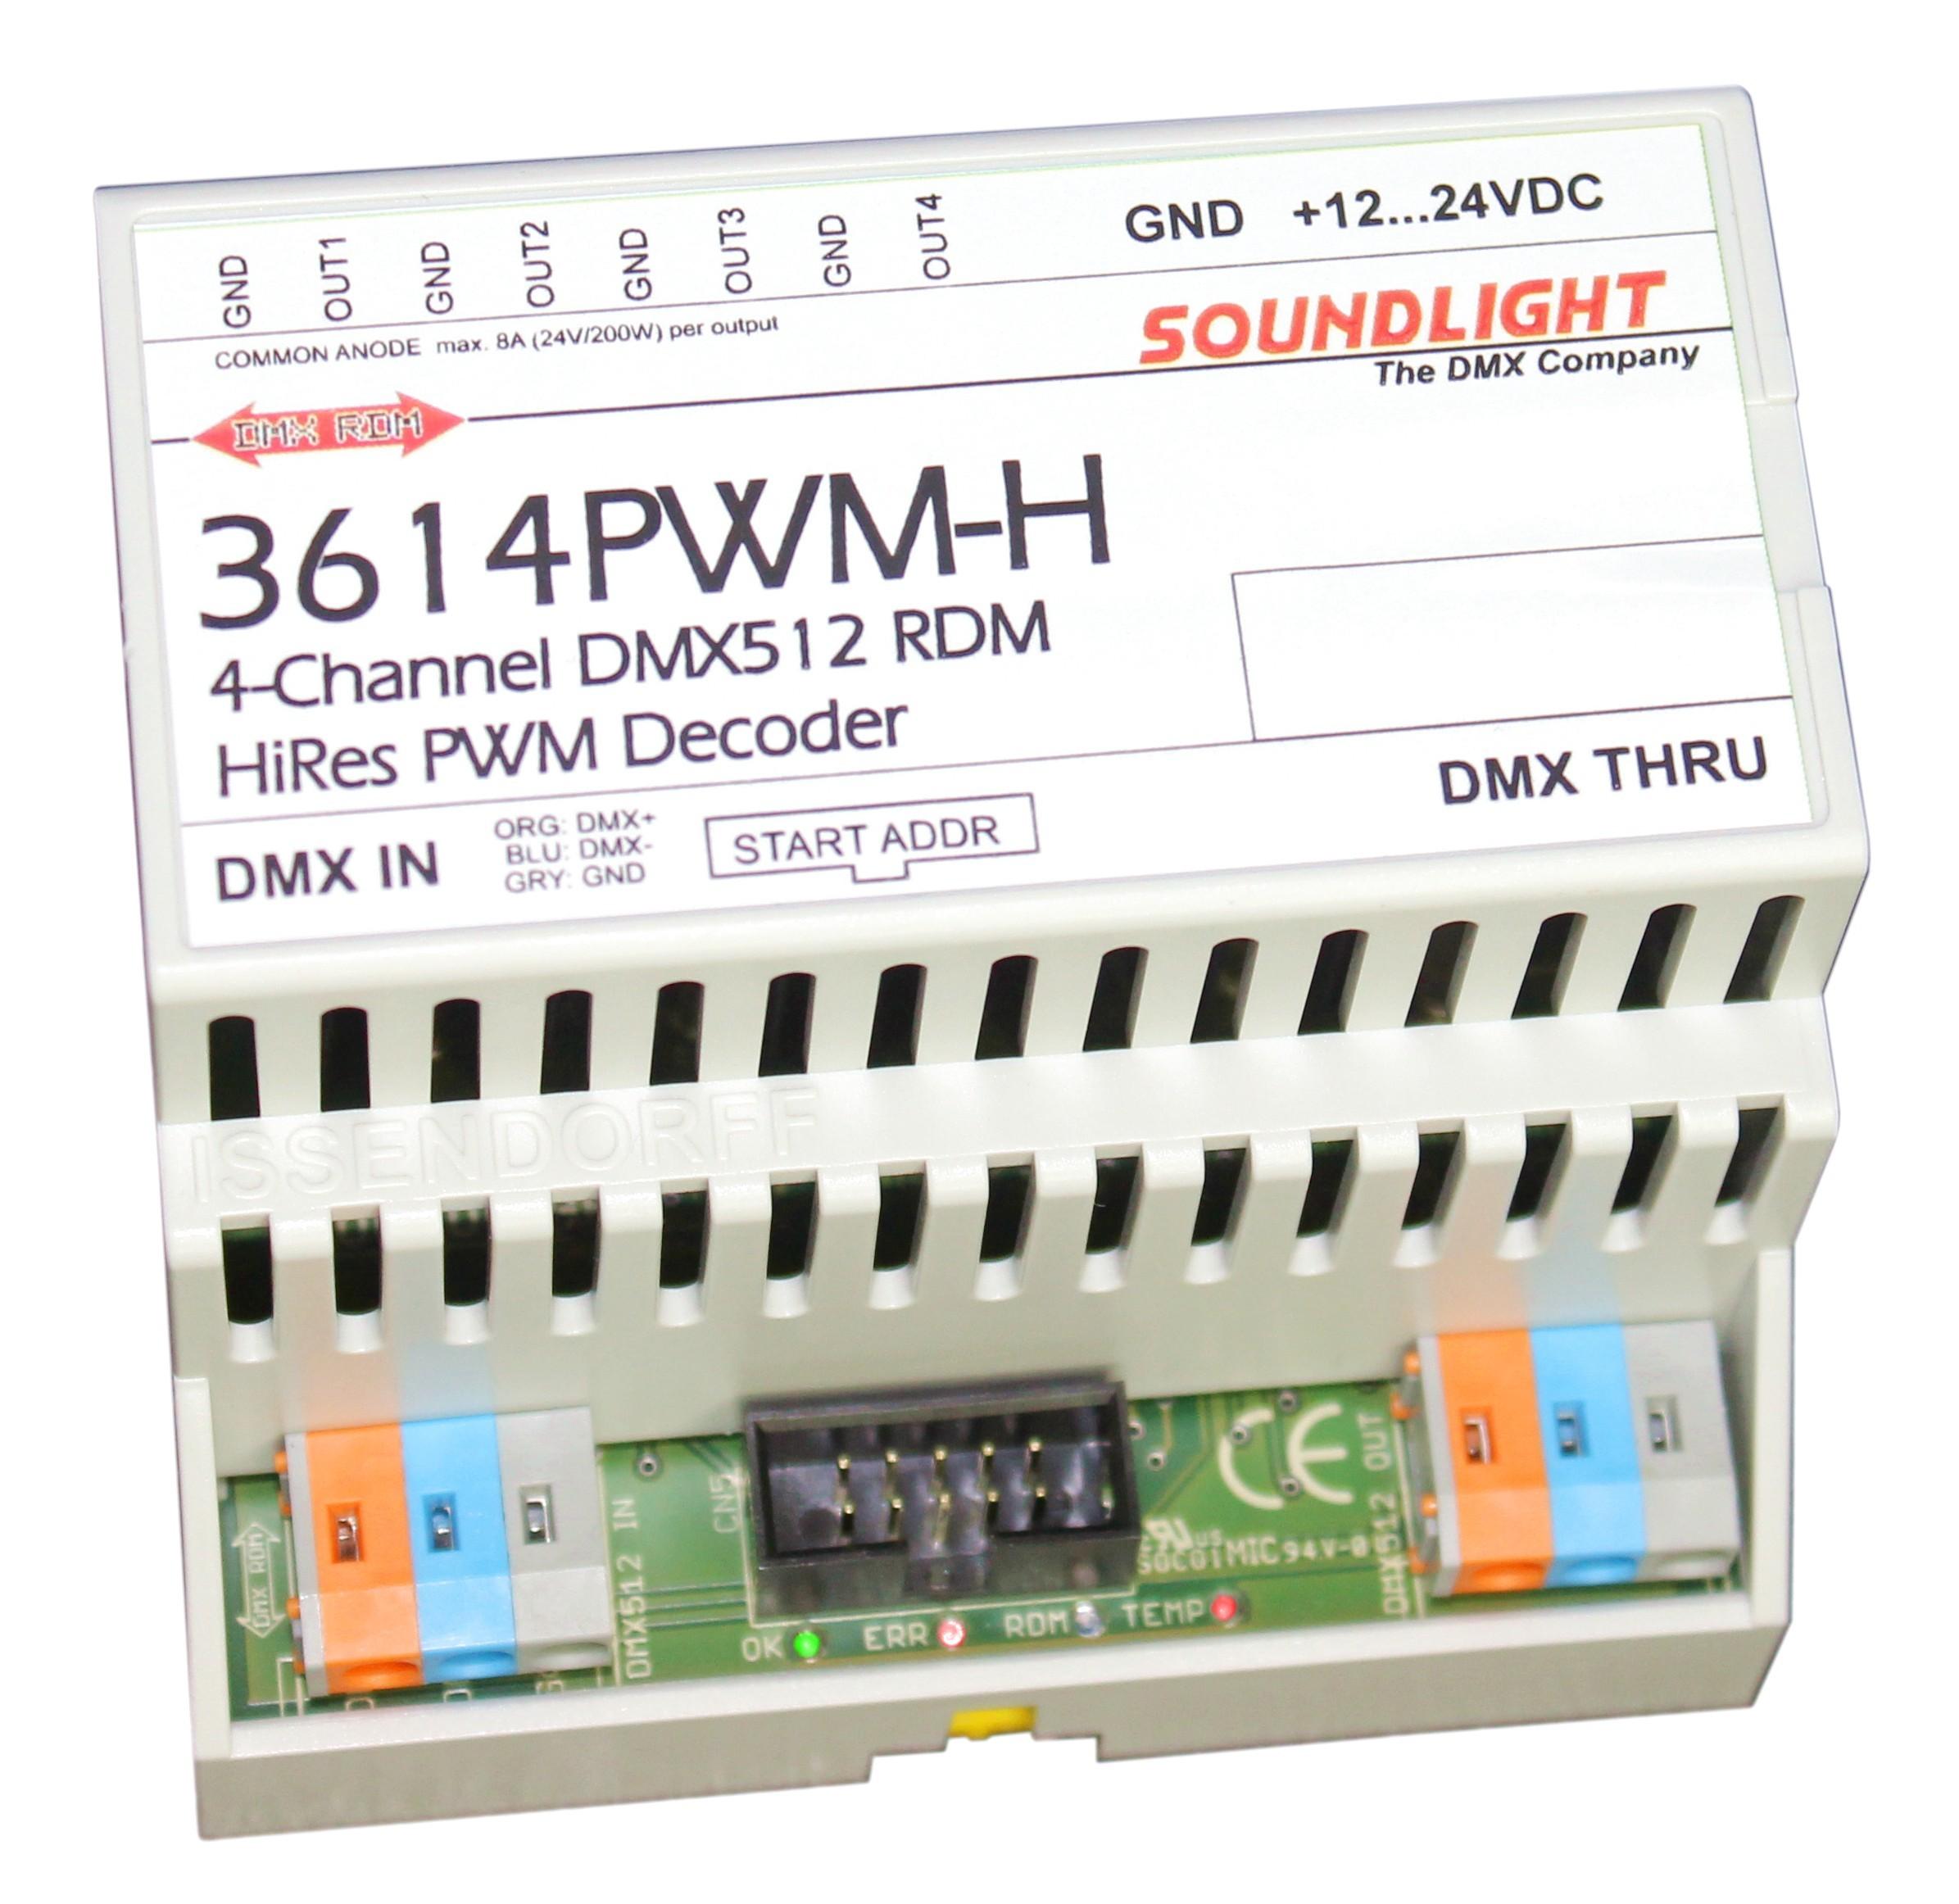 SOUNDLIGHT 3614PWM-H